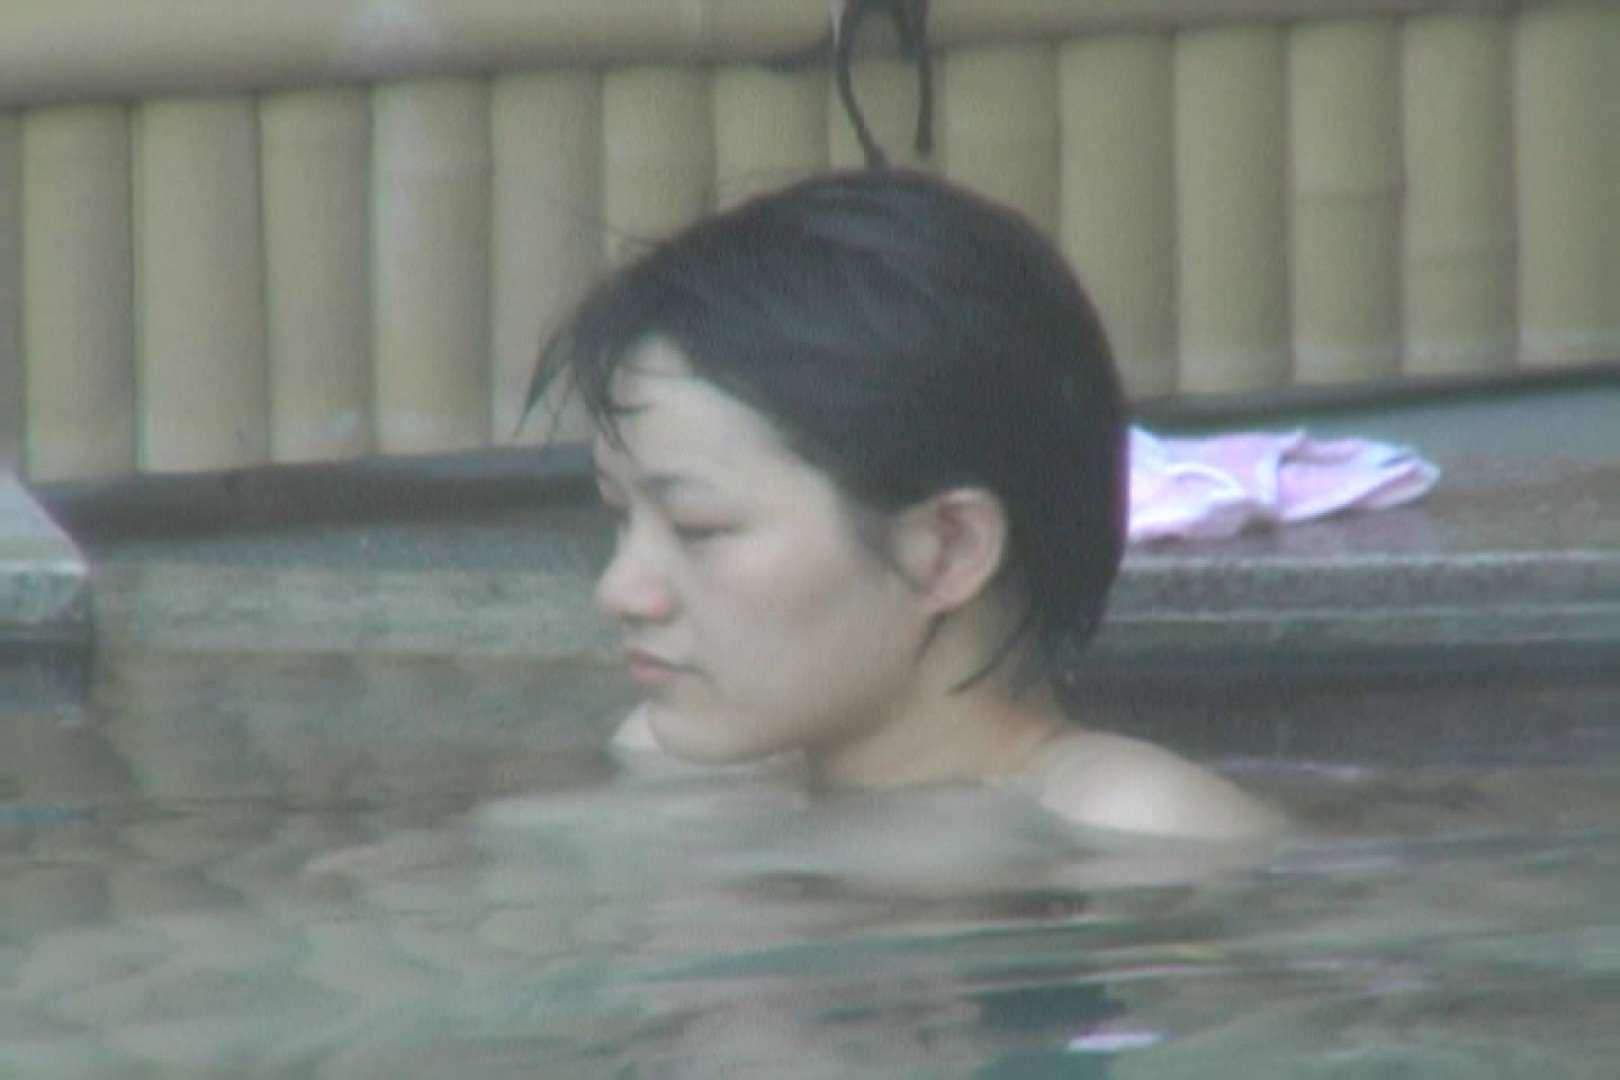 Aquaな露天風呂Vol.116 露天風呂編 | 盗撮シリーズ  107PIX 81